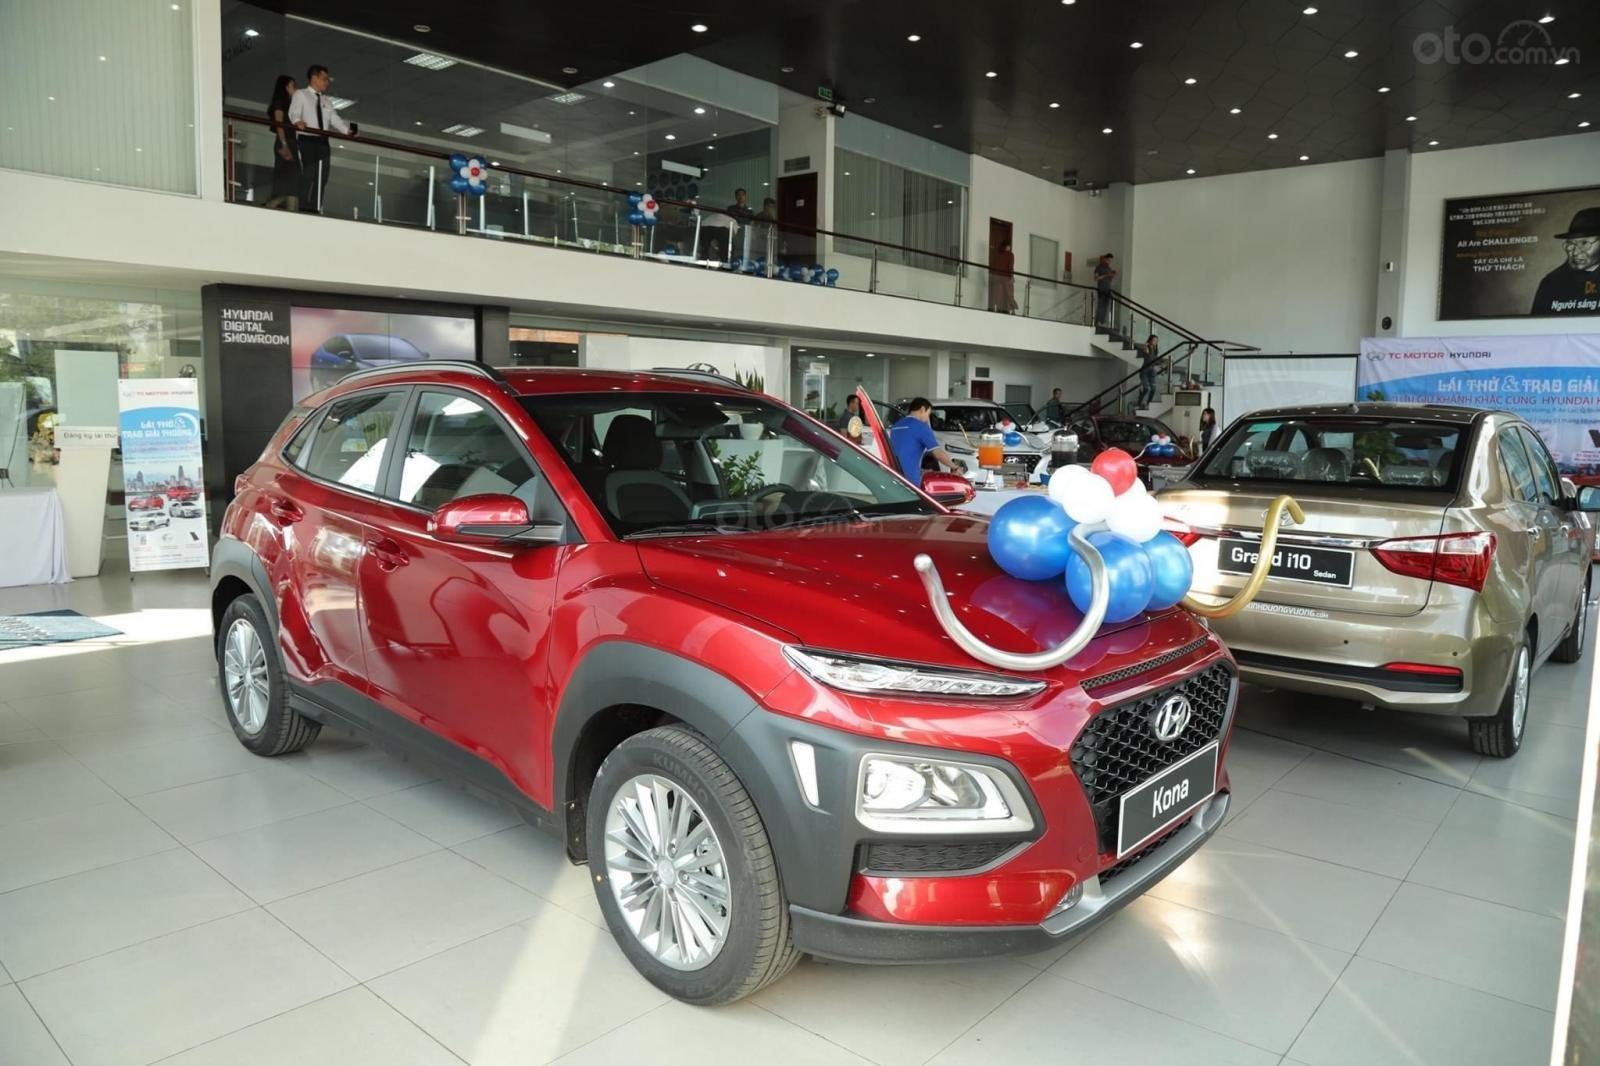 Hyundai 3S Kinh Dương Vương (9)